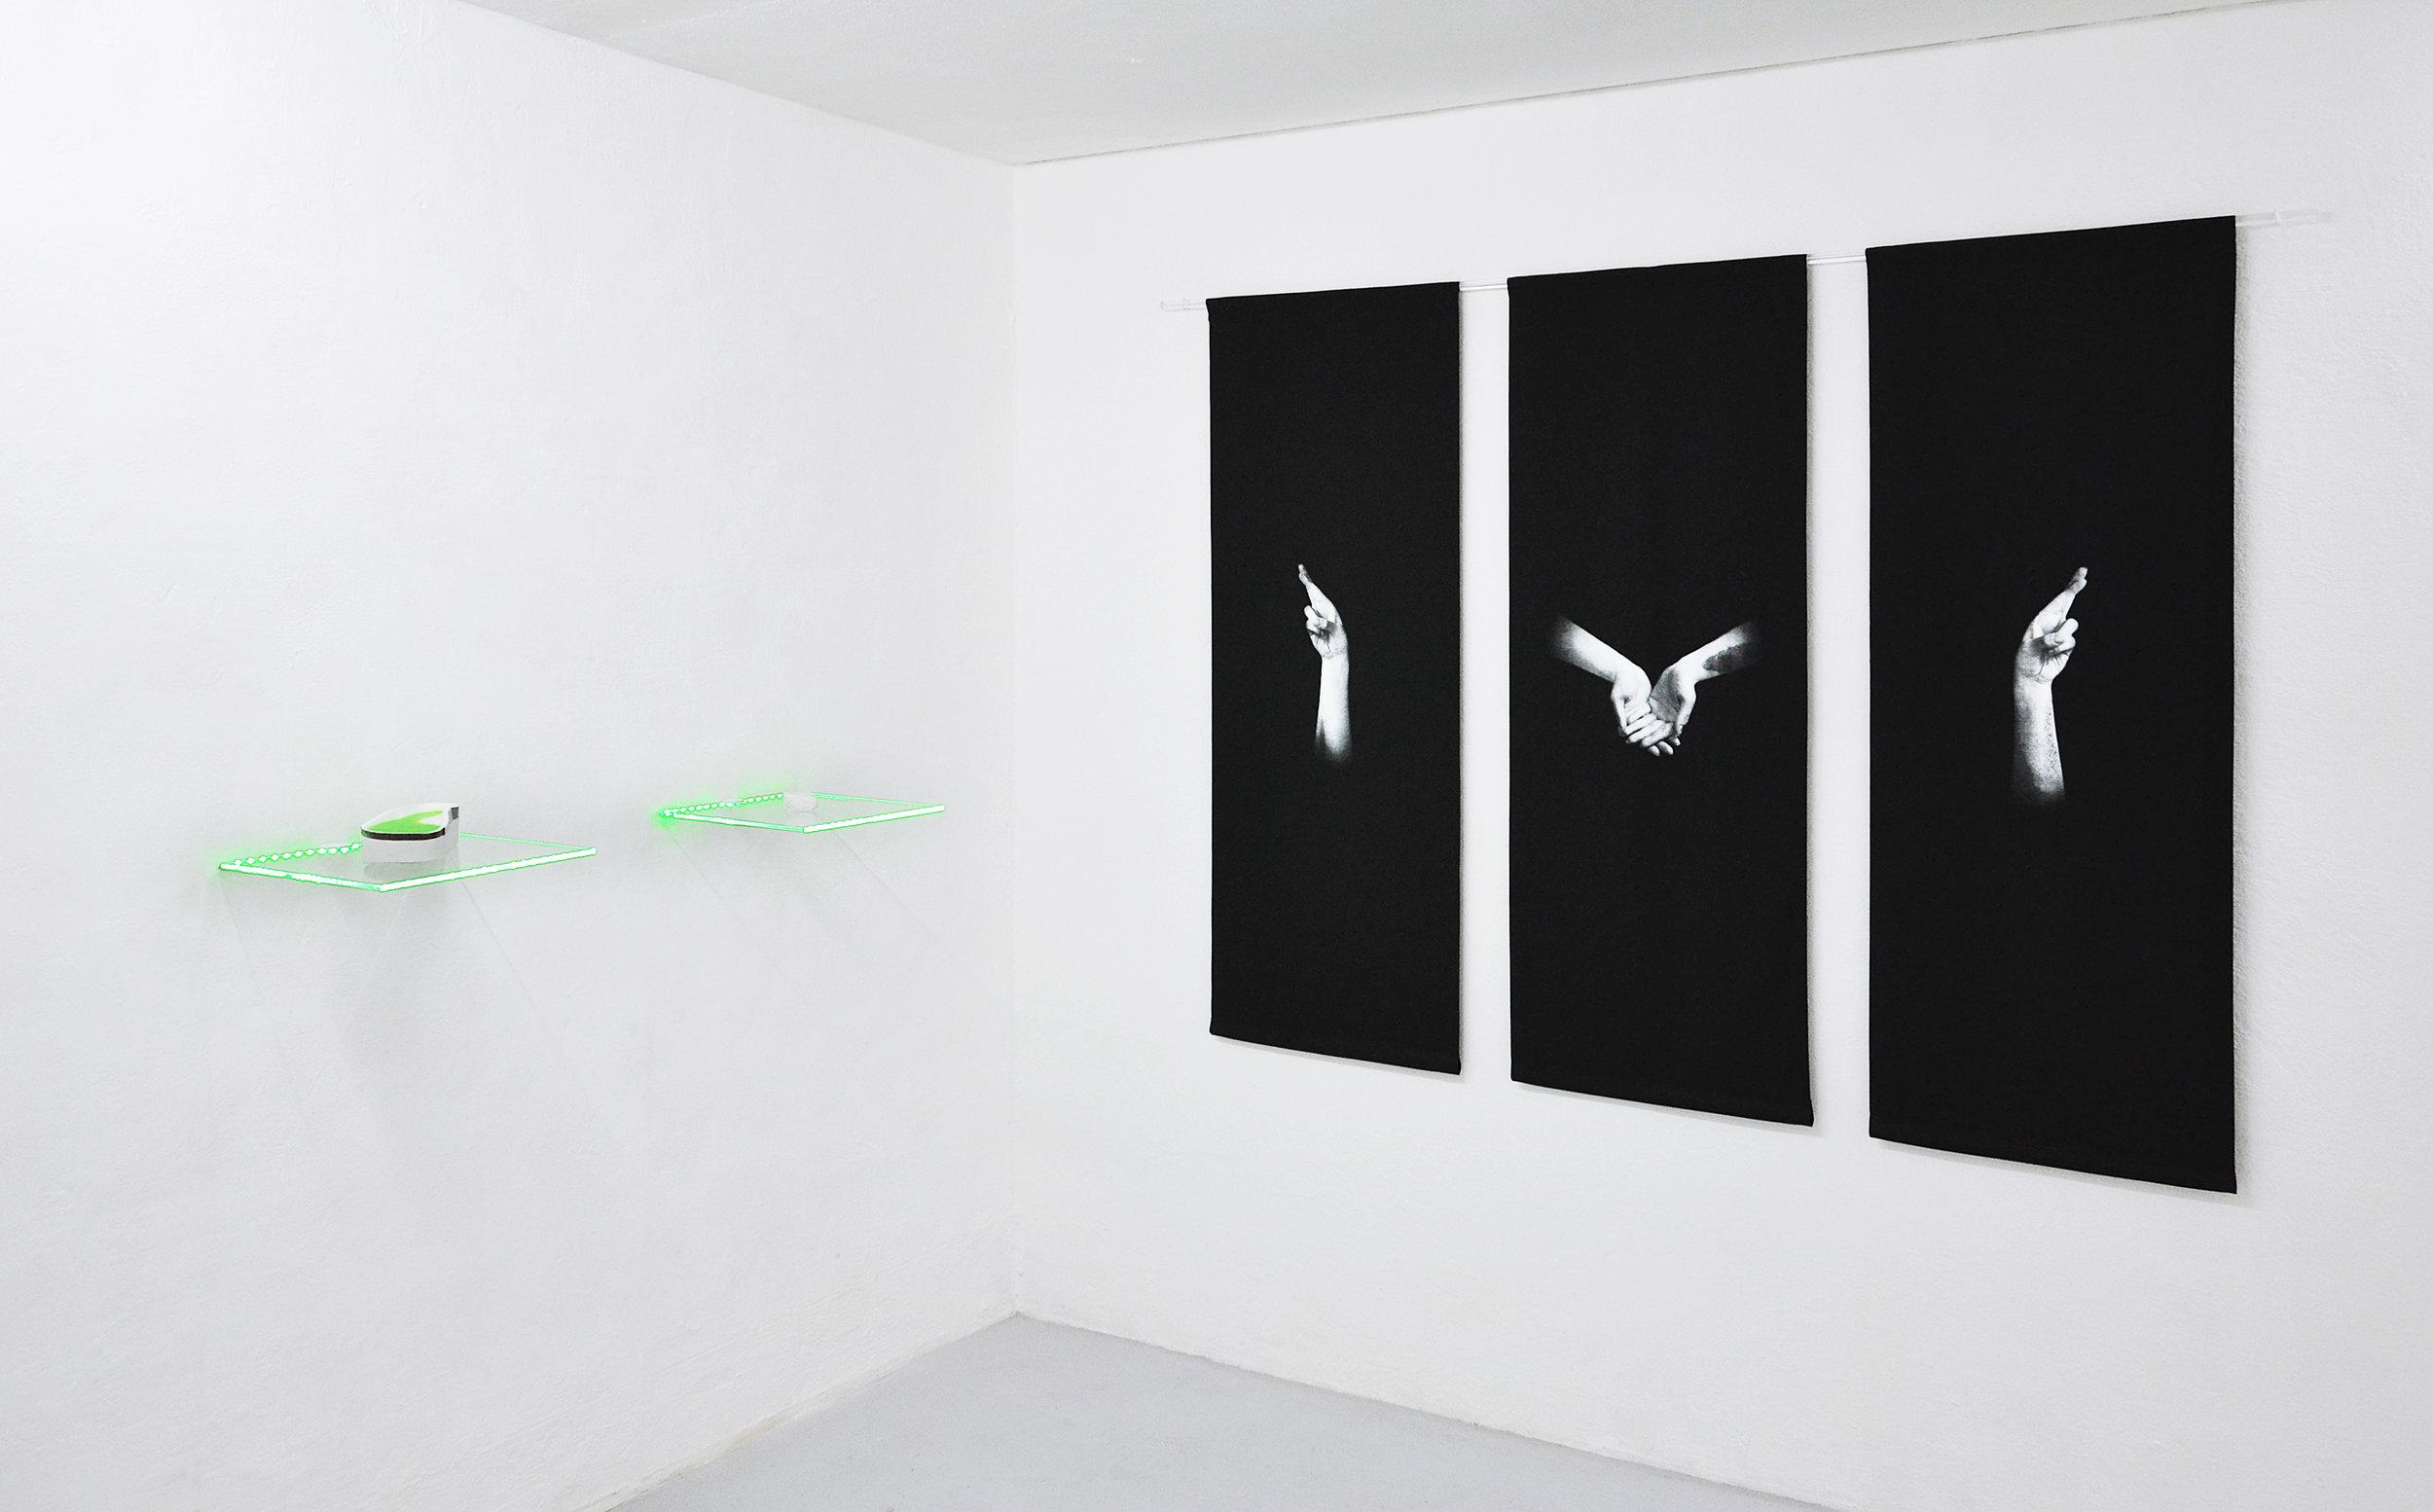 02 Tania Fiaccadori, Sea-Monkeys Cult, installation view, Dimora Artica, 2018.jpg